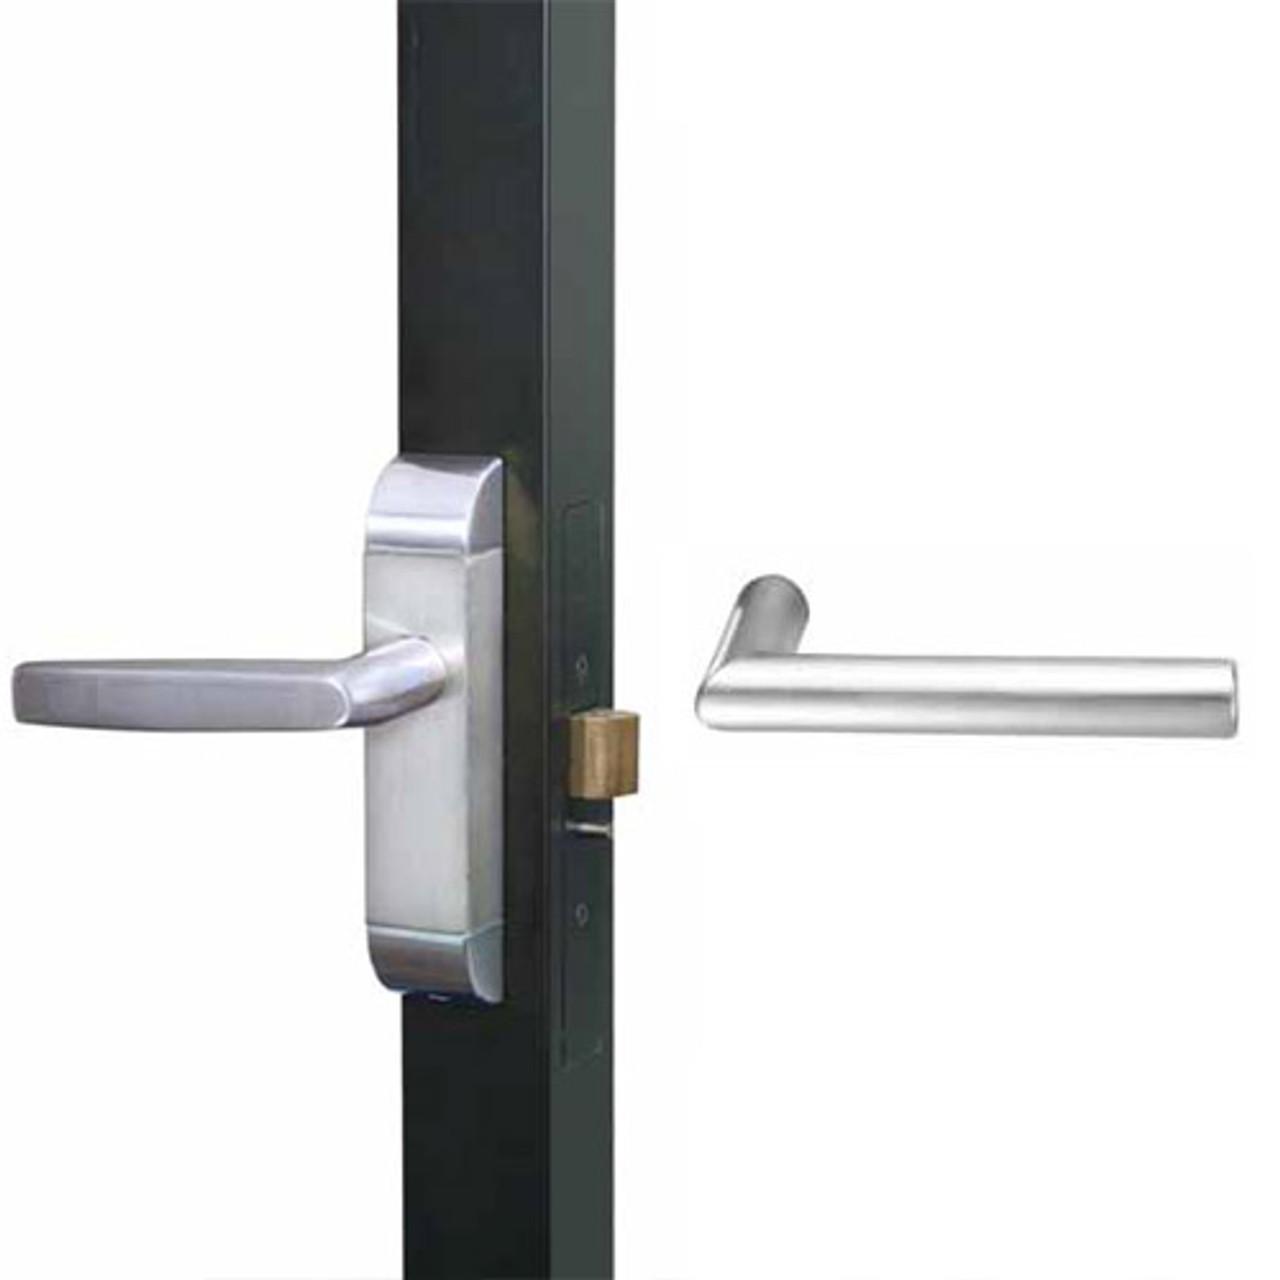 4600-MI-642-US32 Adams Rite MI Designer Deadlatch handle in Bright Stainless Finish